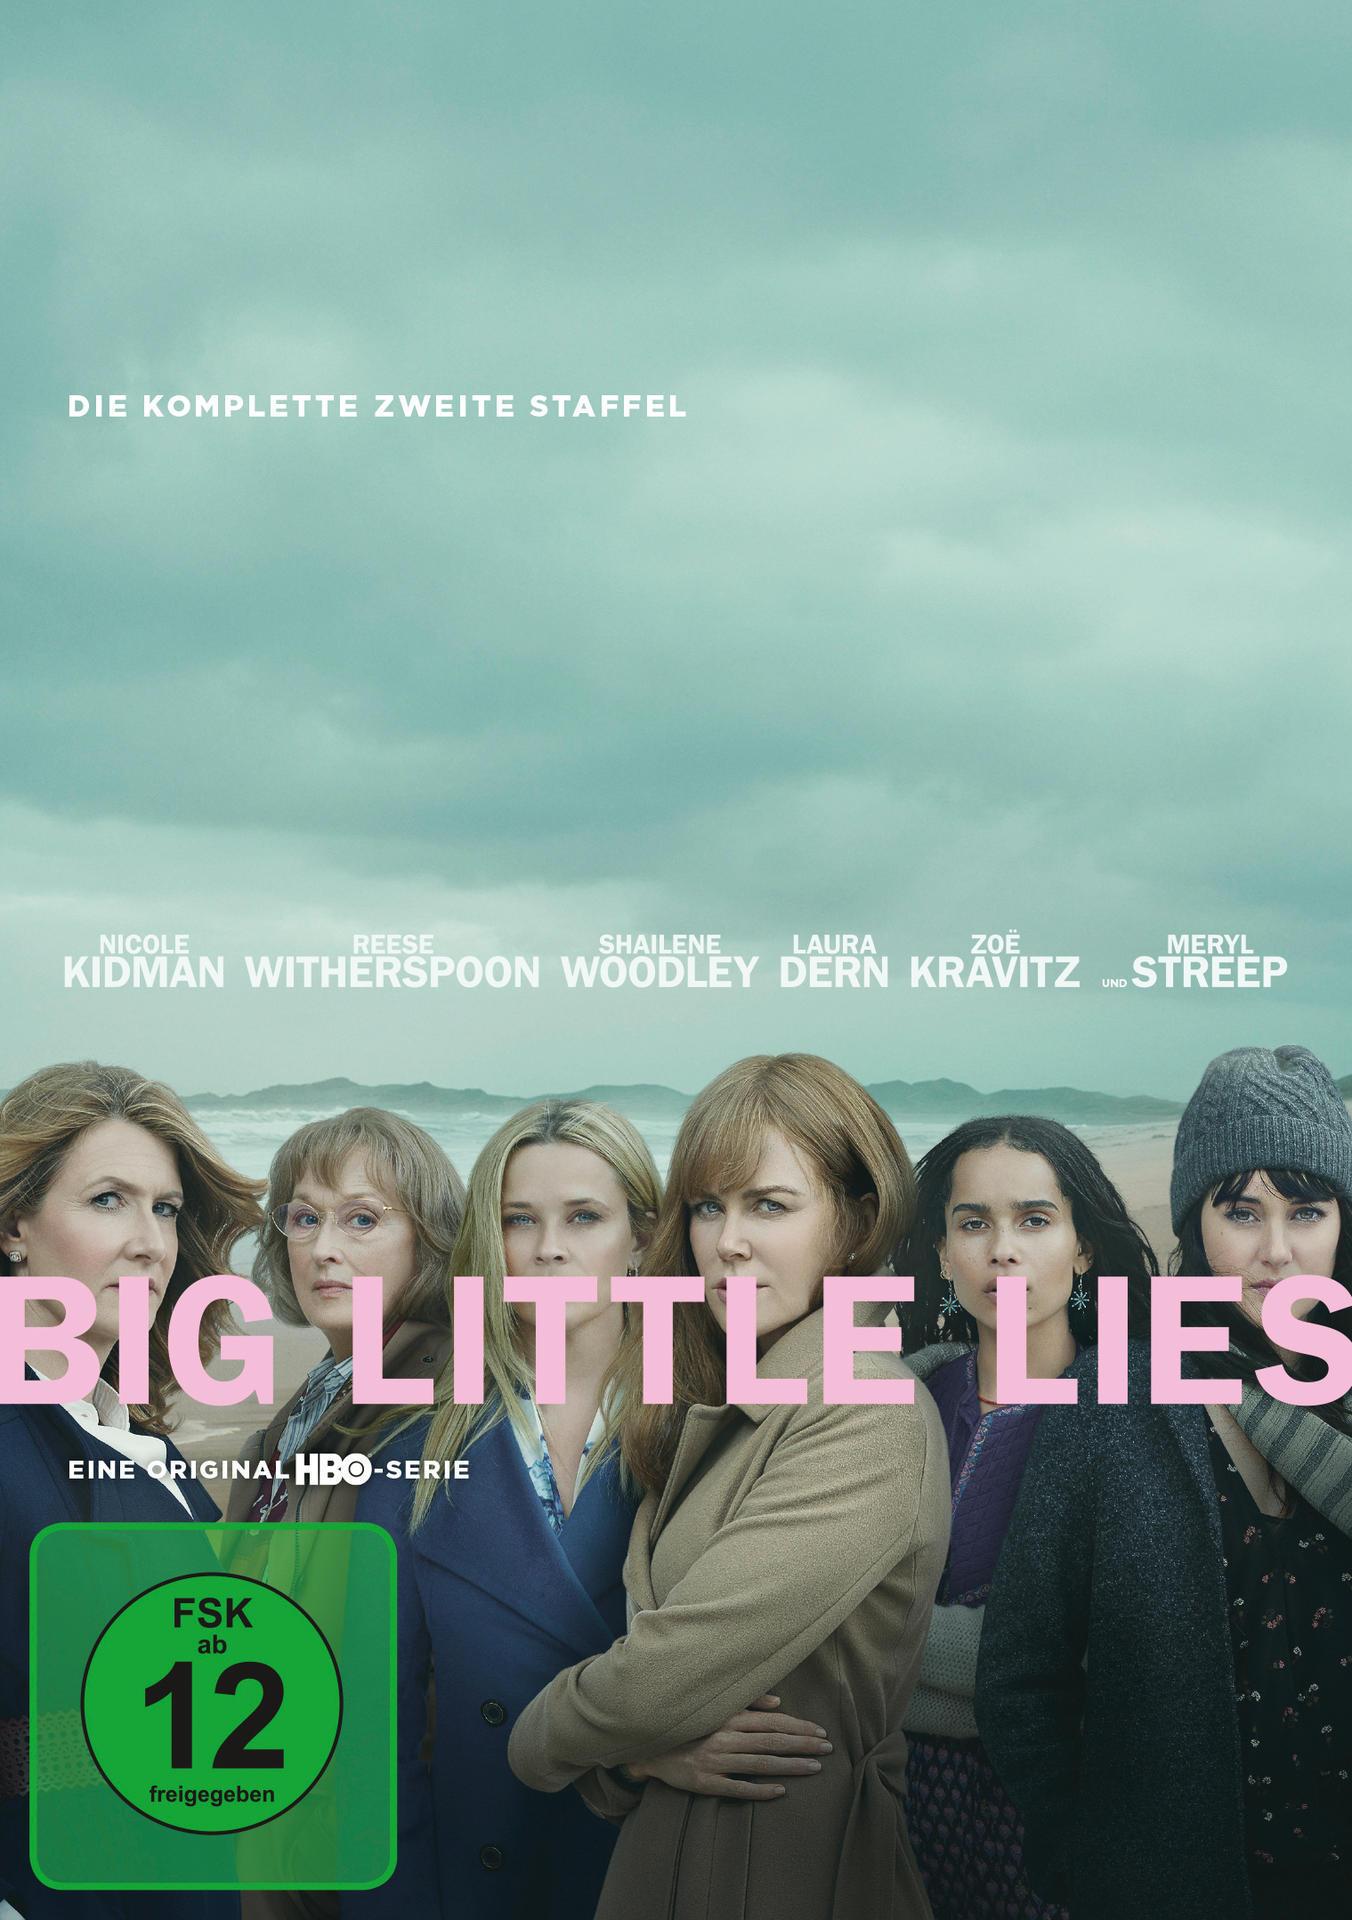 Big Little Lies - Staffel 2 - 2 Disc DVD (DVD) für 23,46 Euro